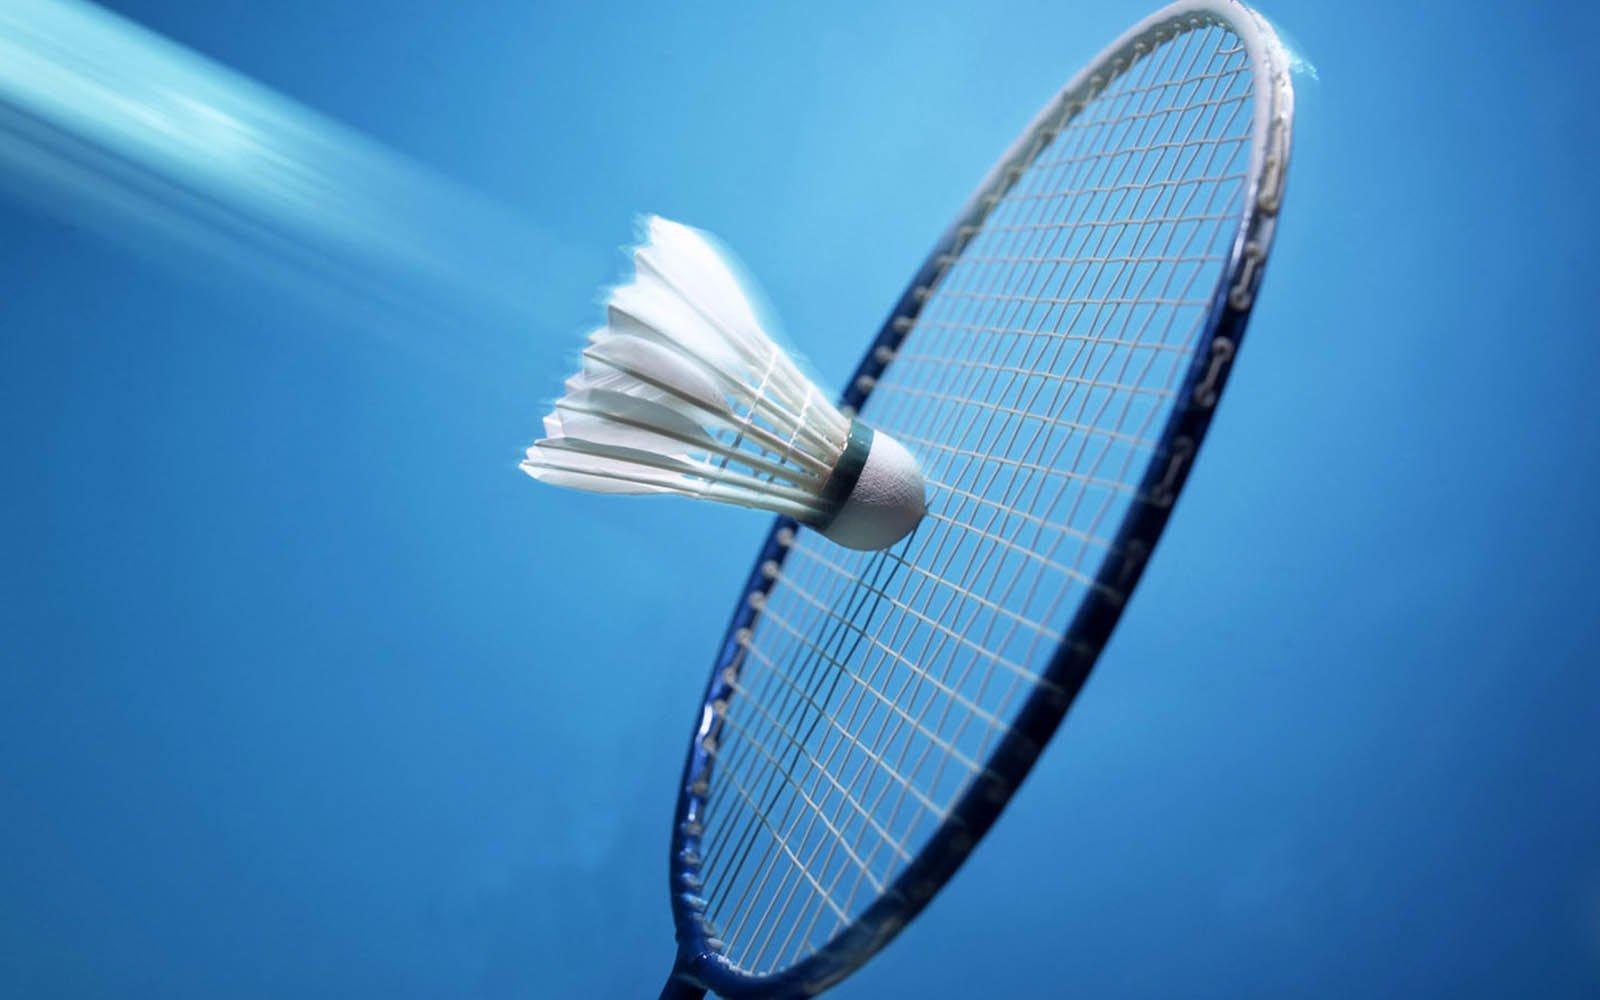 Sports - Badminton  Wallpaper